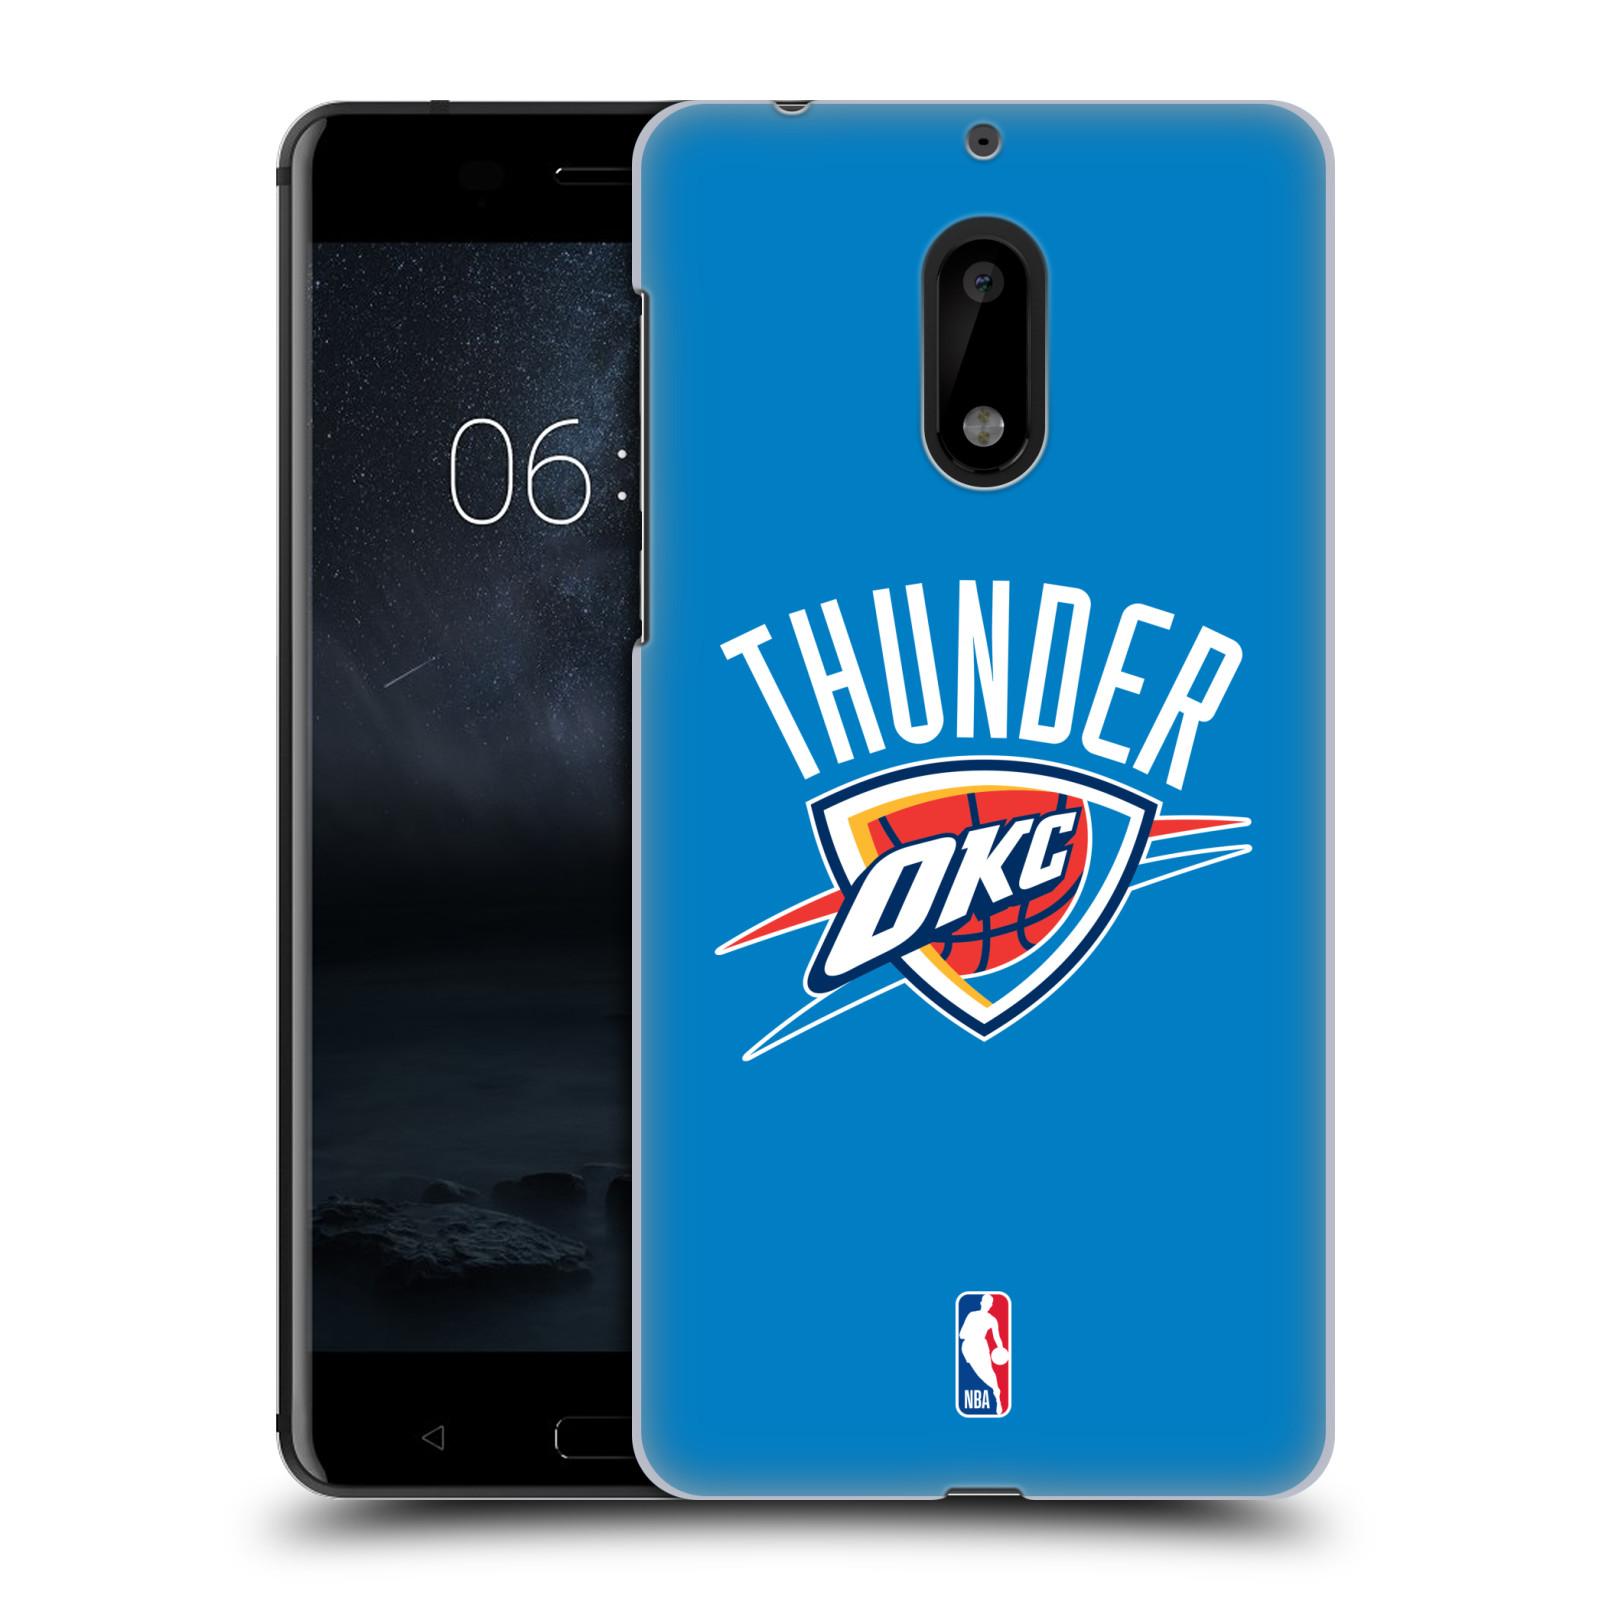 OFFICIAL-NBA-OKLAHOMA-CITY-THUNDER-HARD-BACK-CASE-FOR-NOKIA-PHONES-1